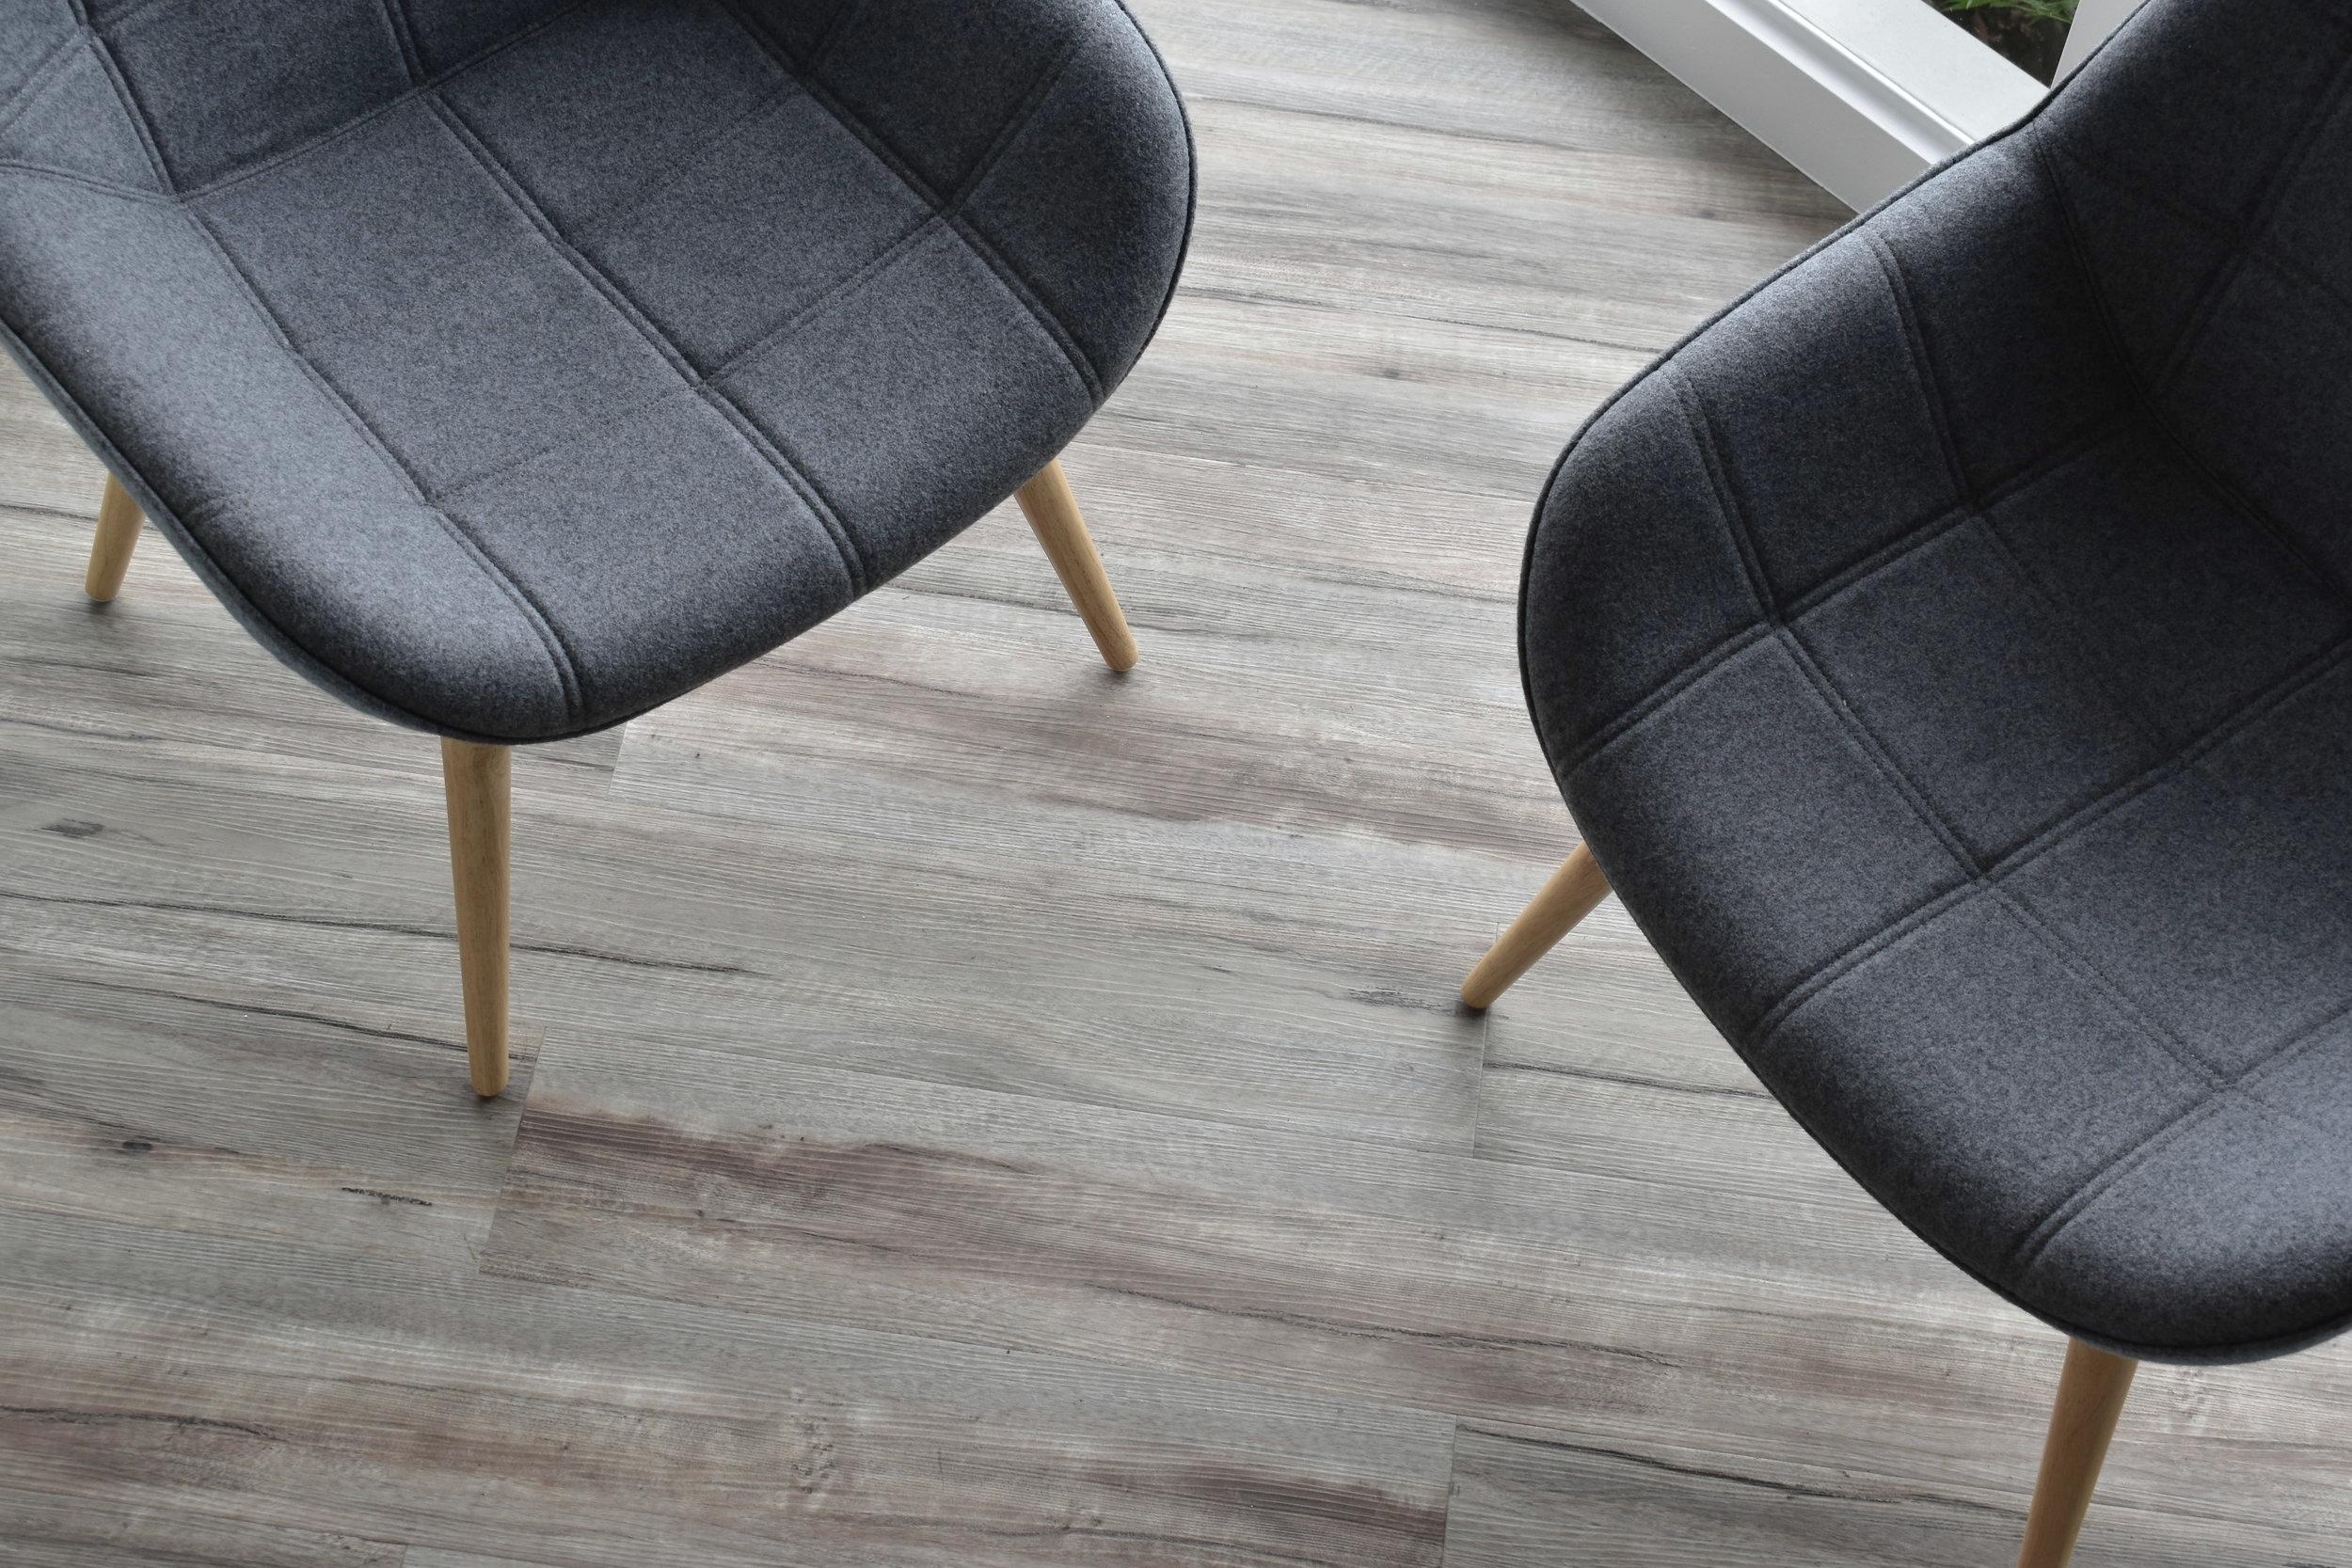 Soft seating and new wood plank viynl floor.